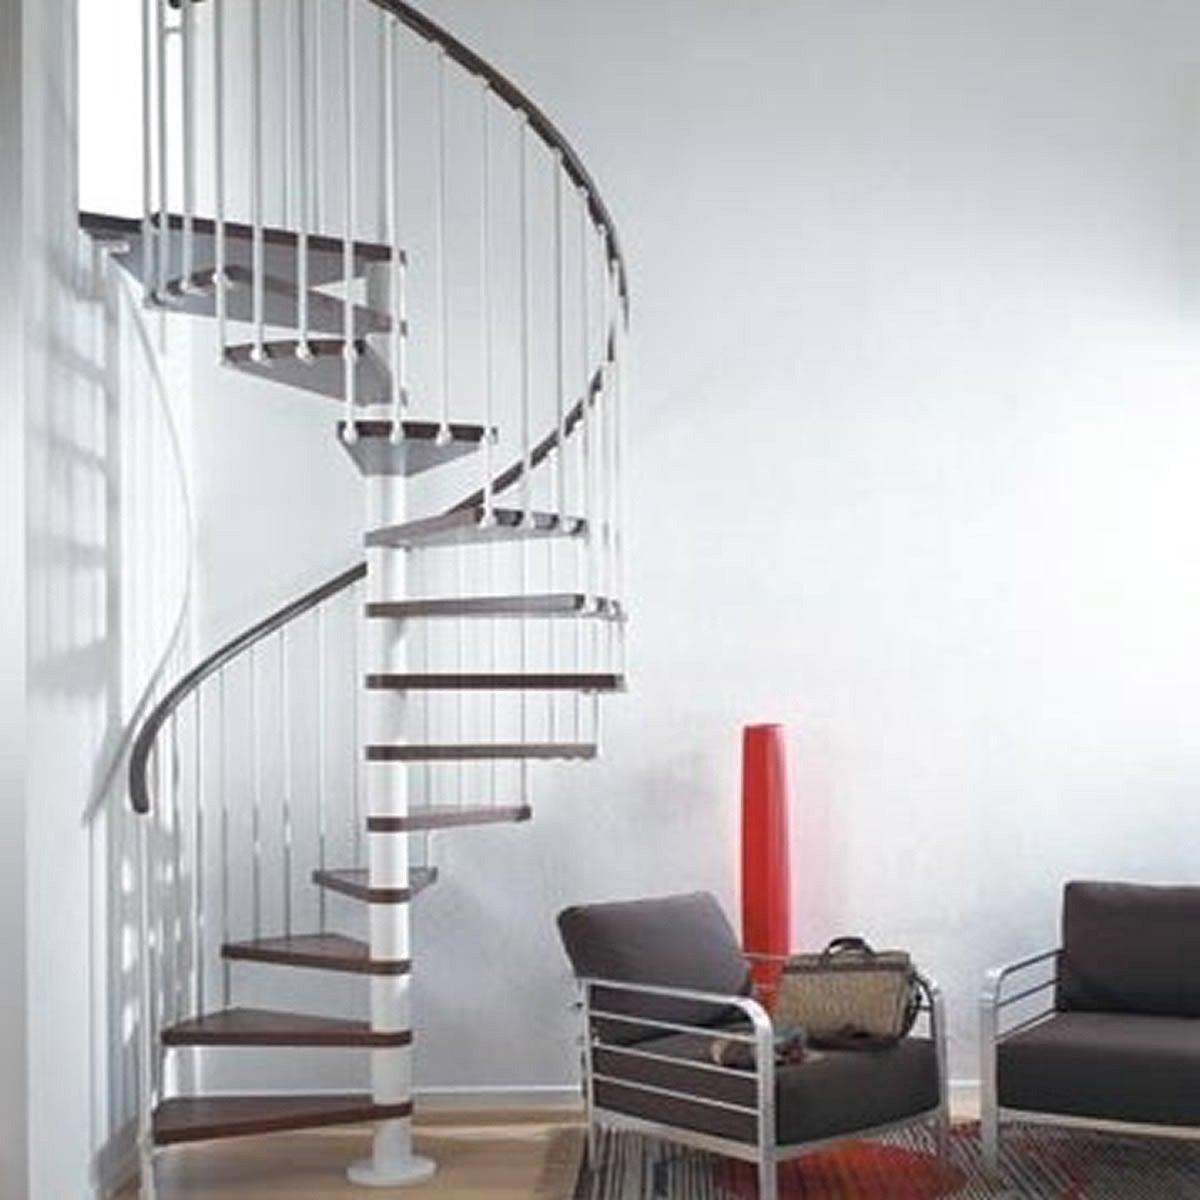 Peinture escalier leroy merlin id e - Peinture escalier leroy merlin ...